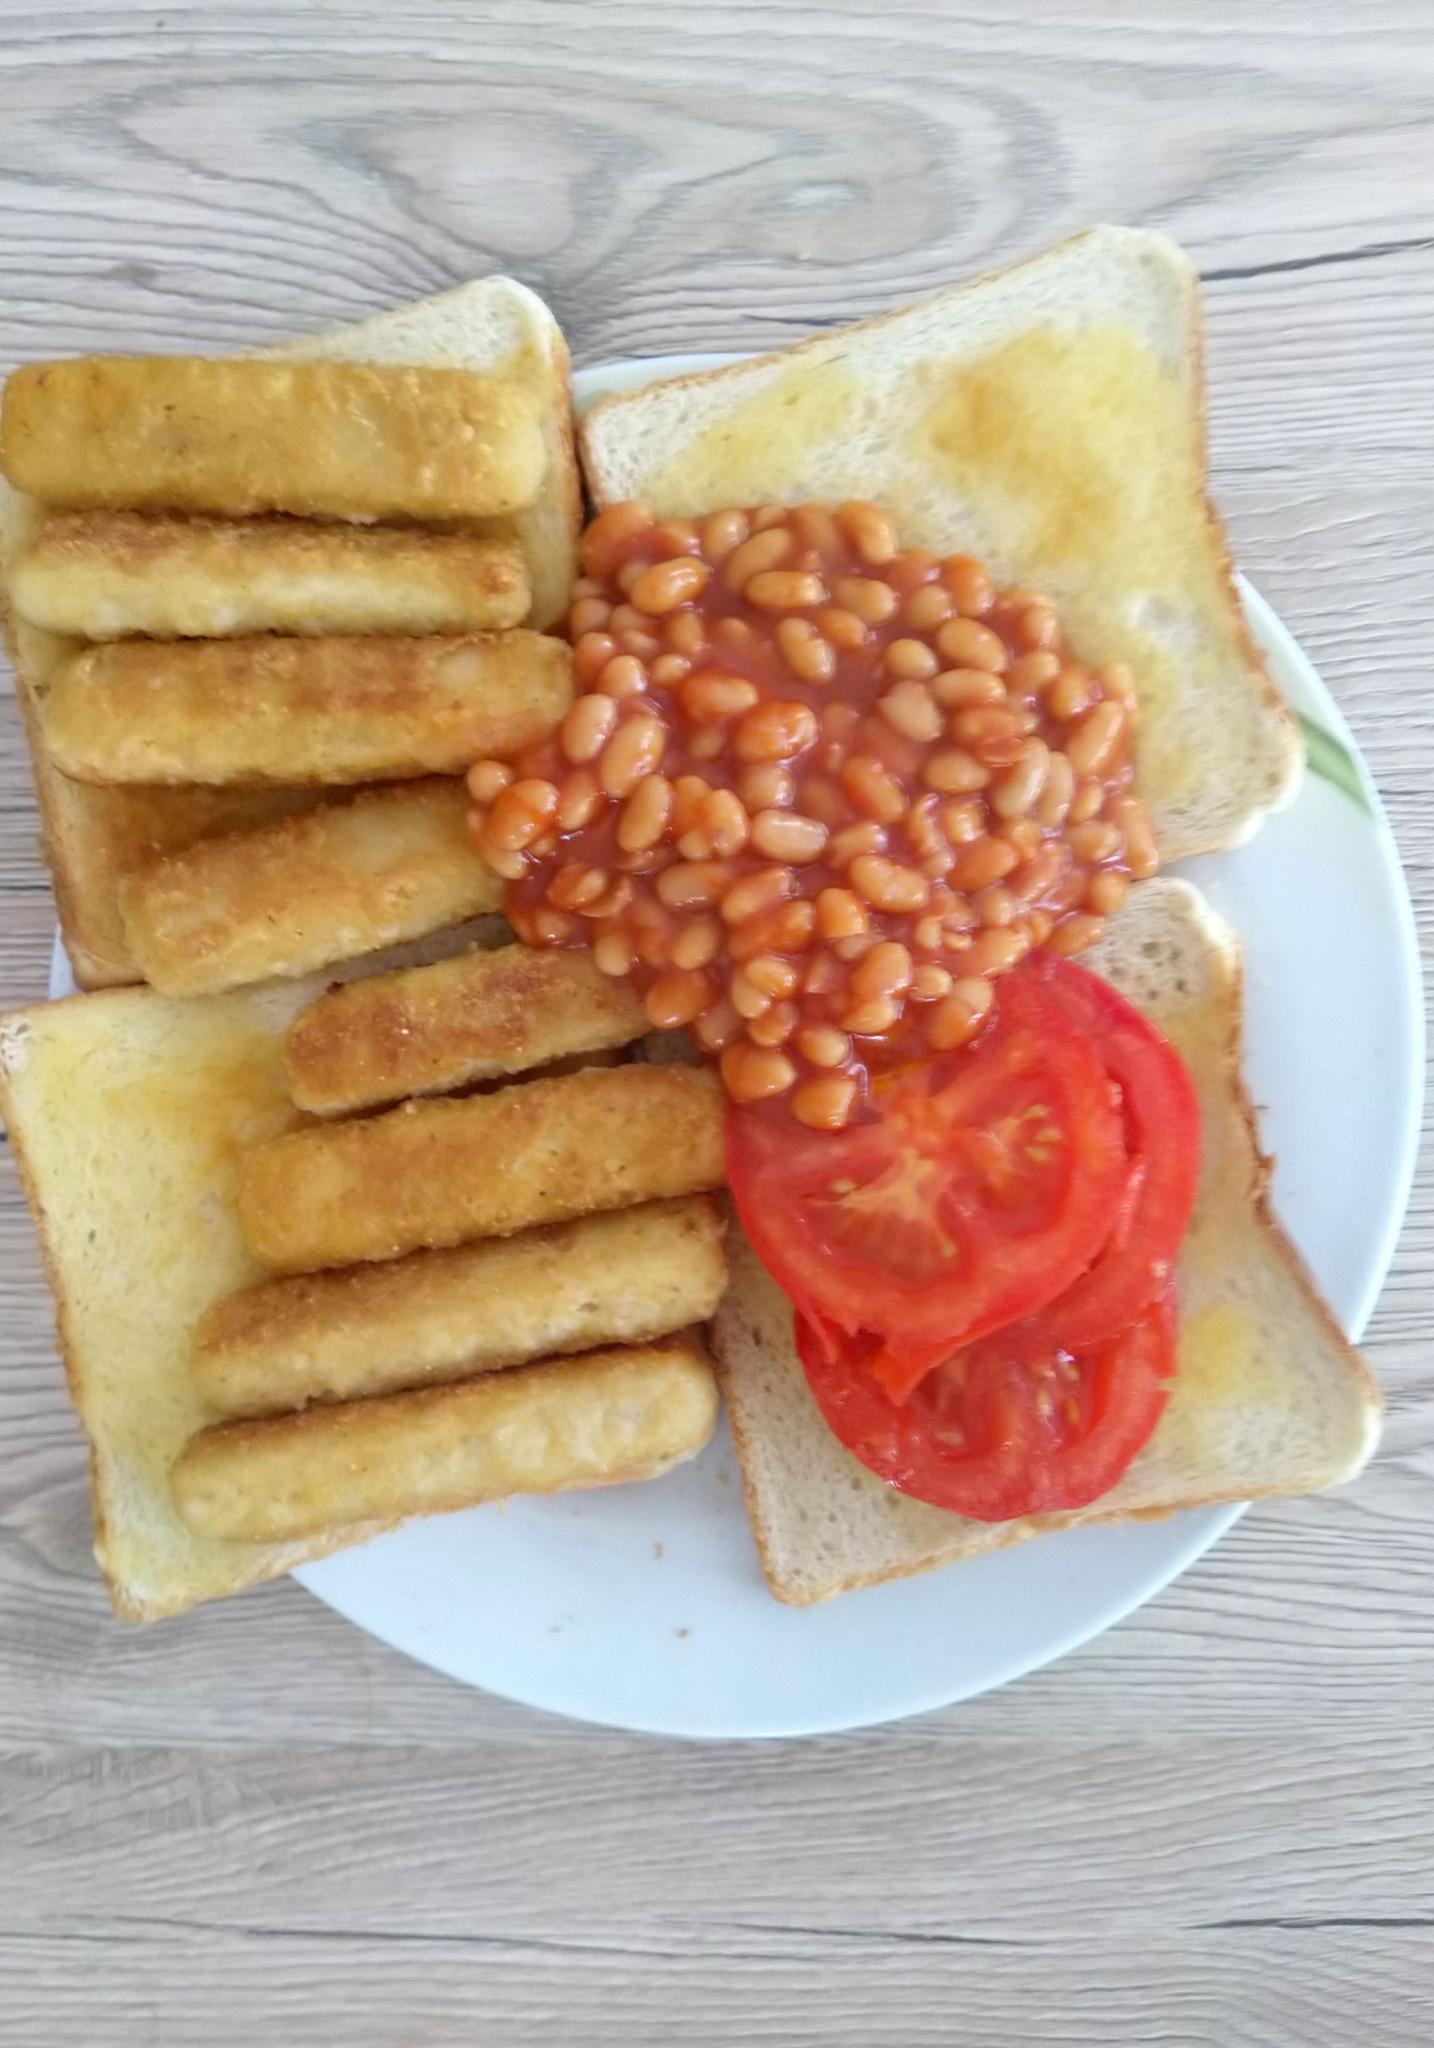 The Baked Bean thread-fish_fingers_n_beans-jpg